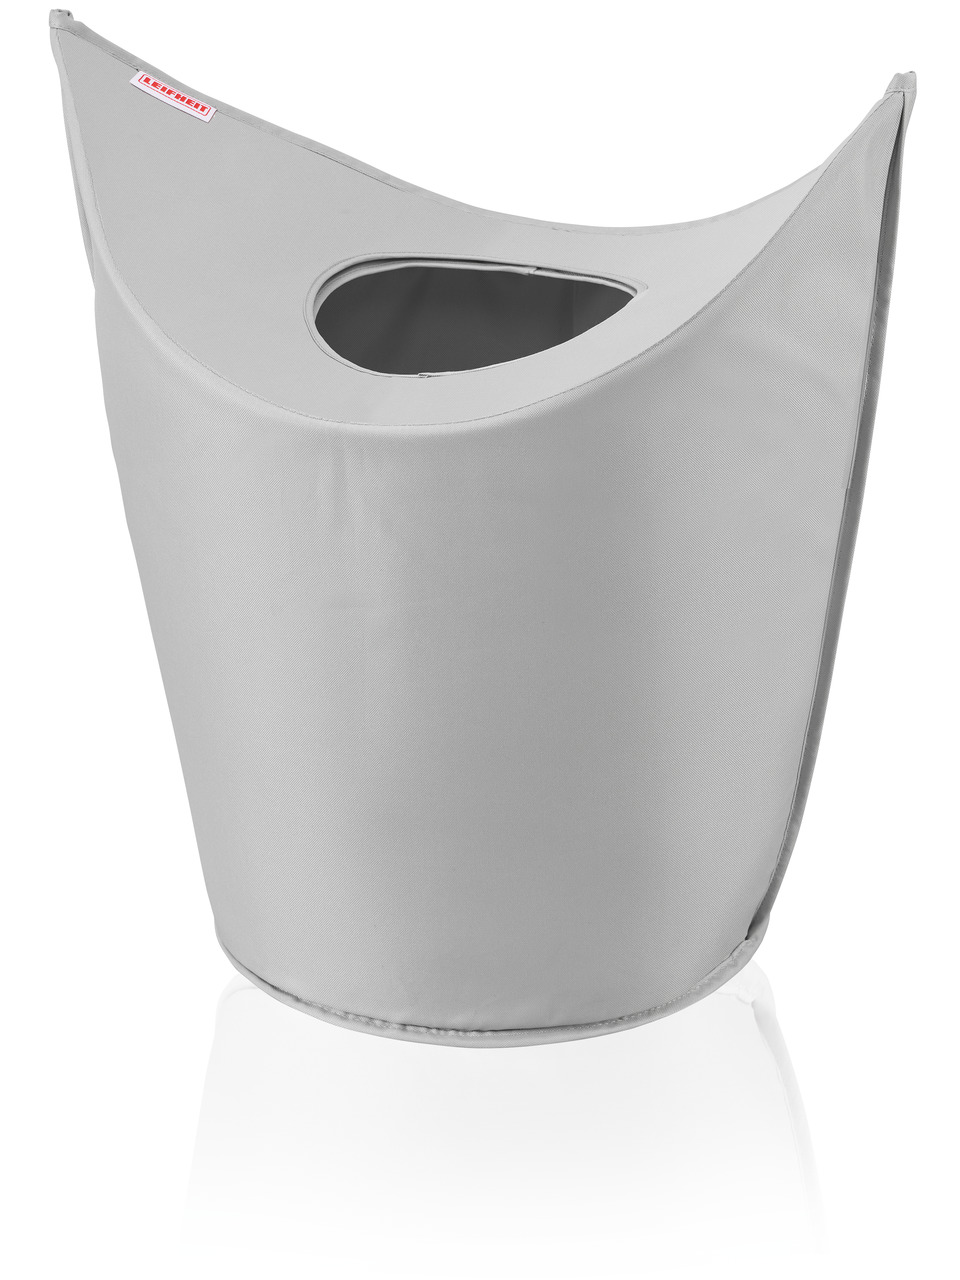 LEIFHEIT Koš na špinavé prádlo – grey LEIFHEIT 80022